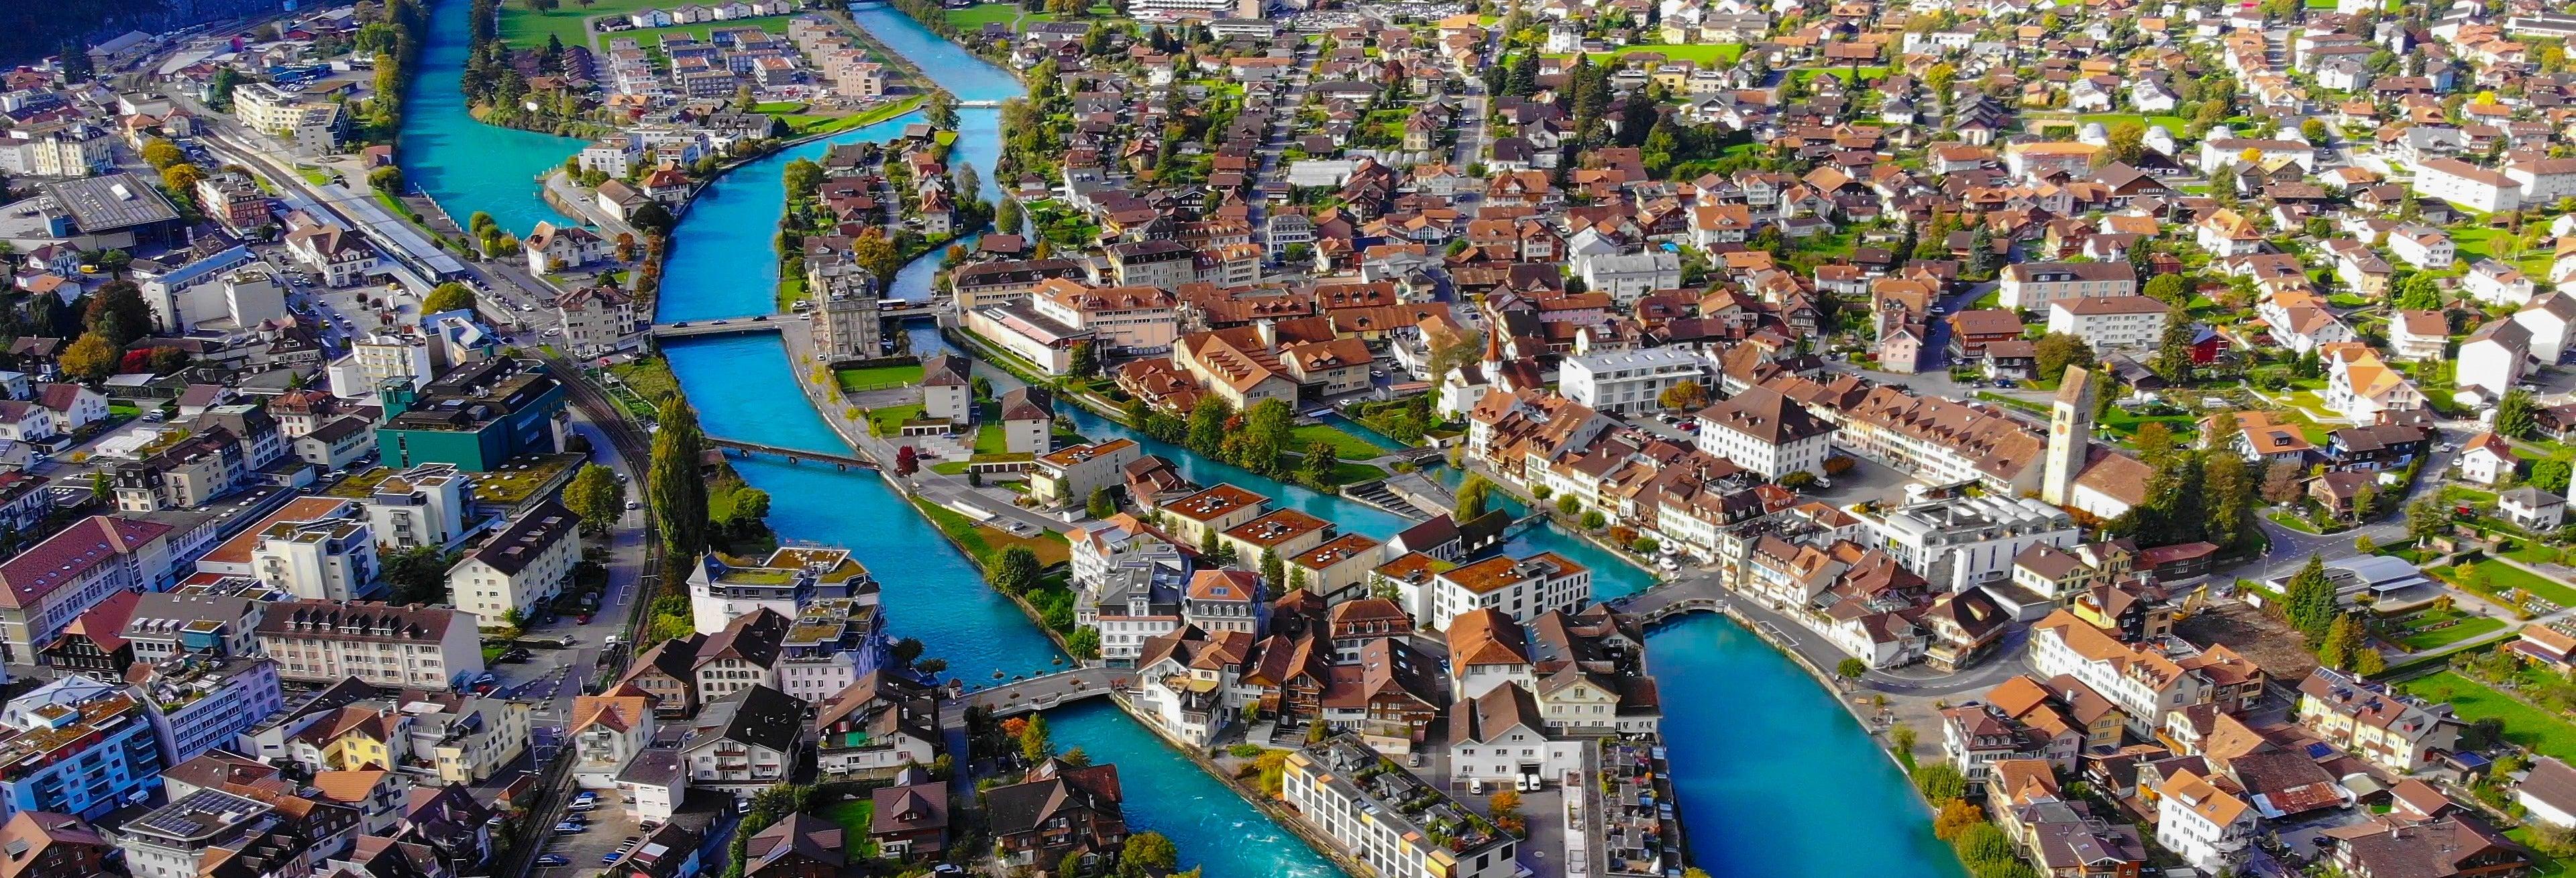 Interlaken & Swiss Alps Green Train Tour